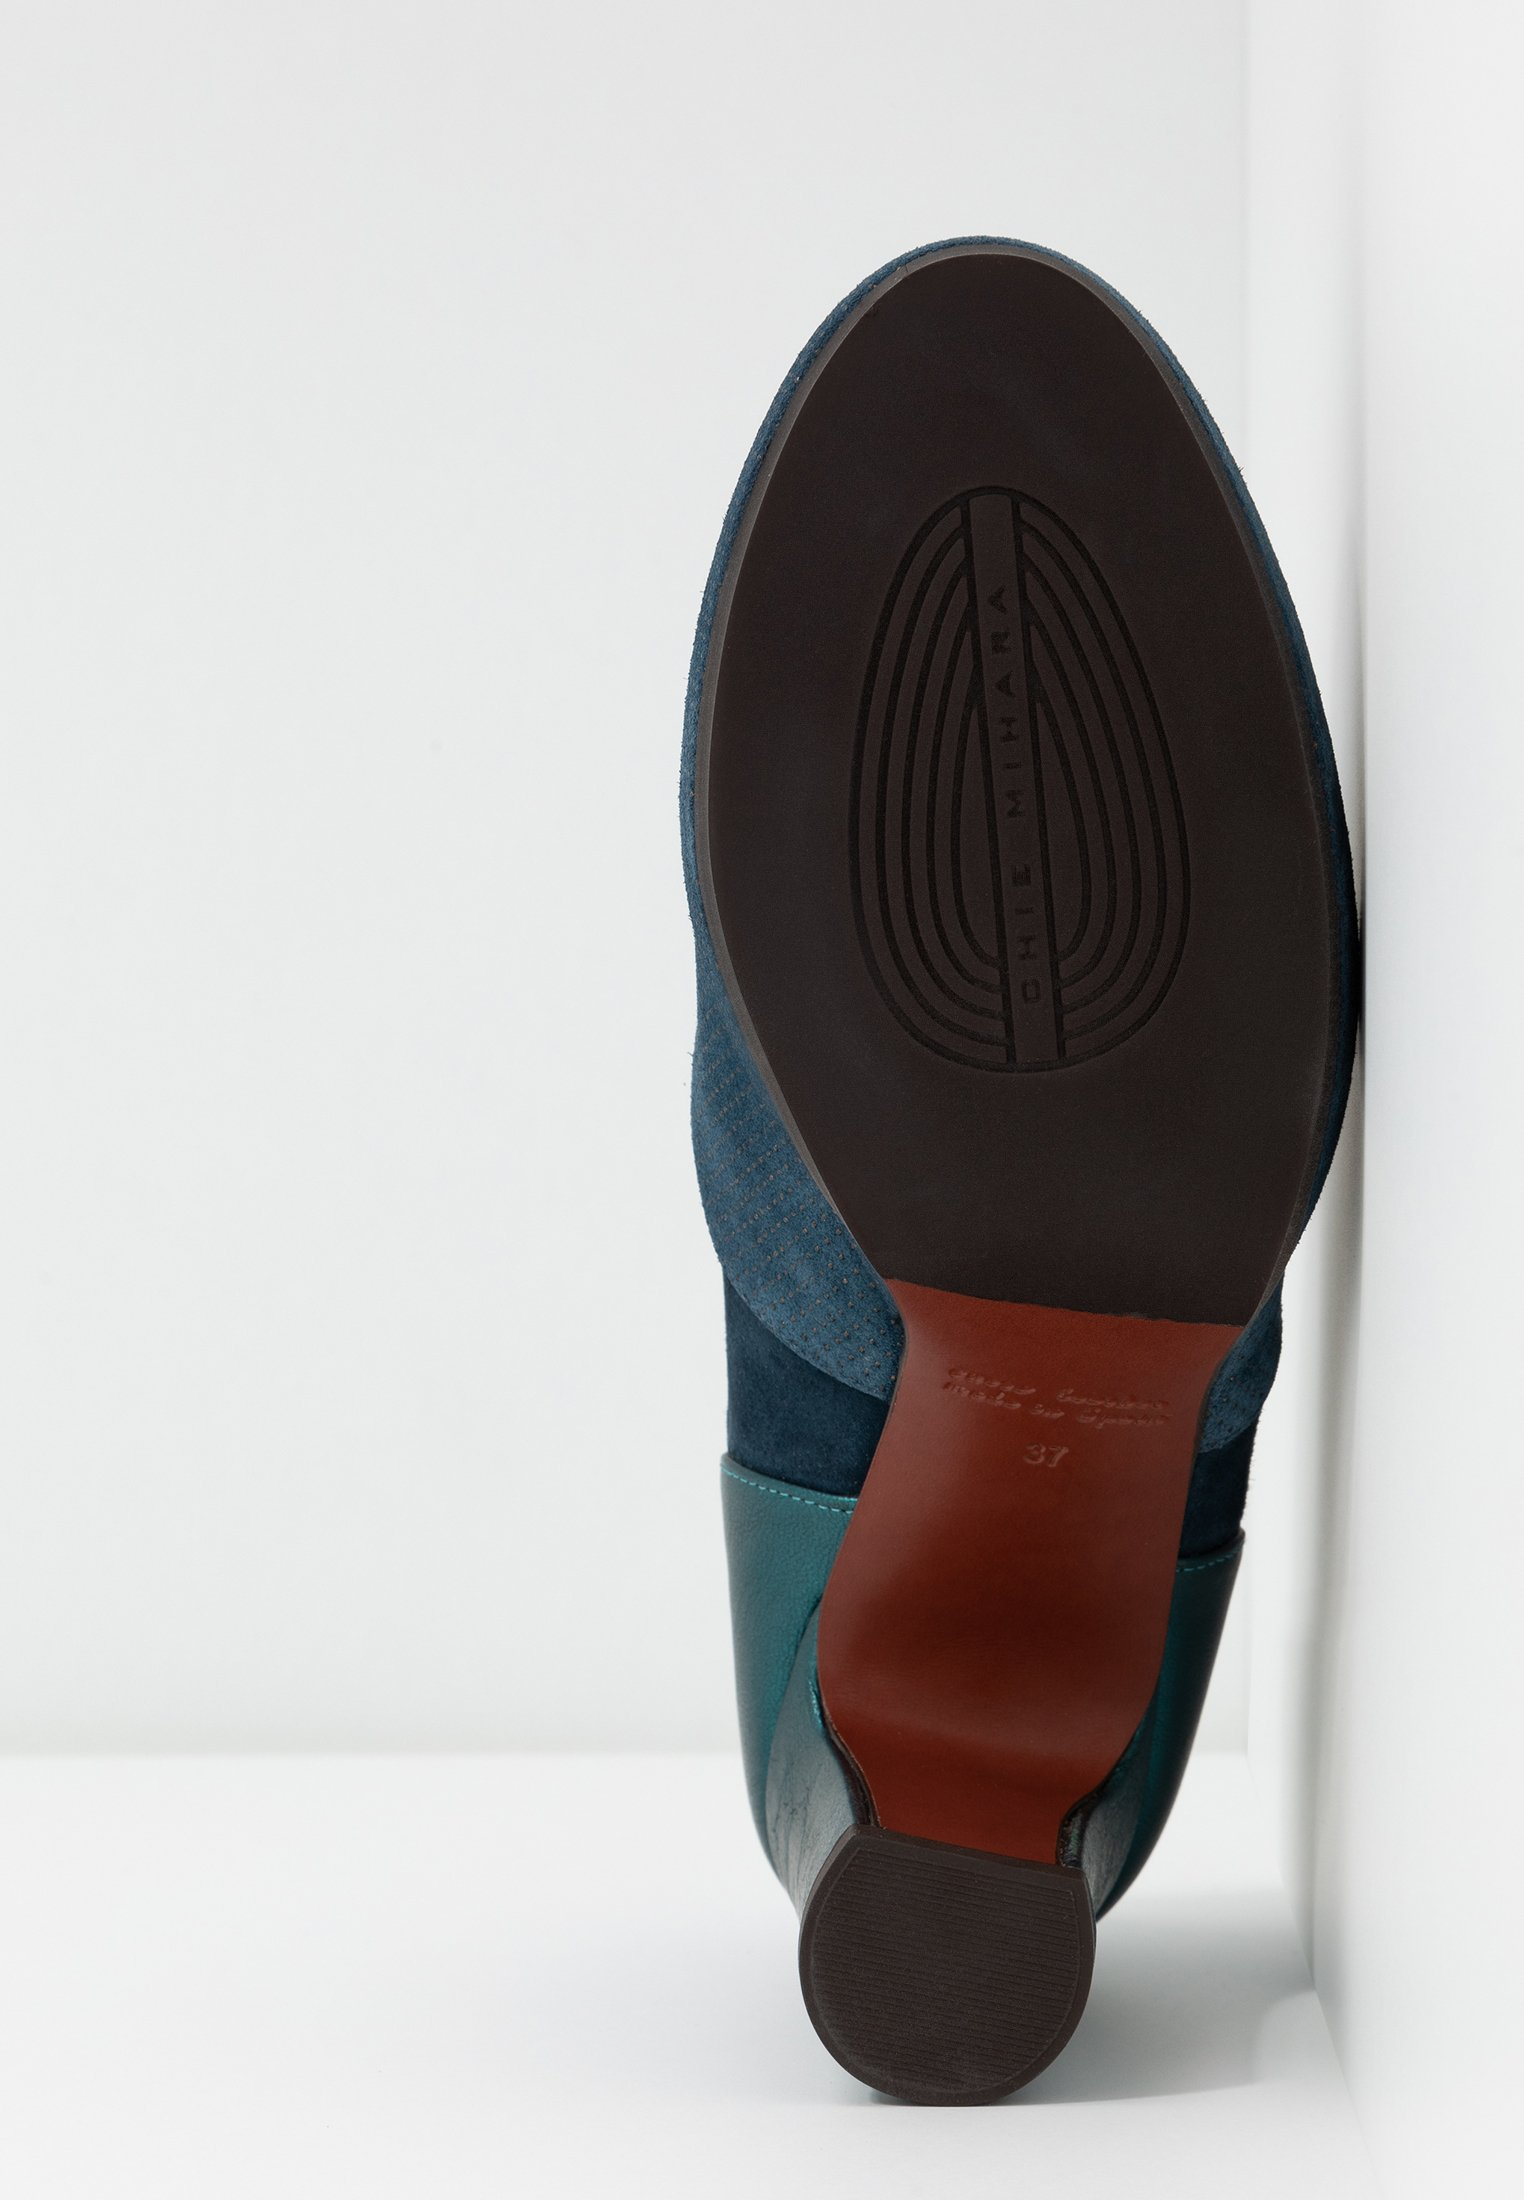 Chie Mihara JOOP - Boots à talons galaxy denim/indigo/picasso mare